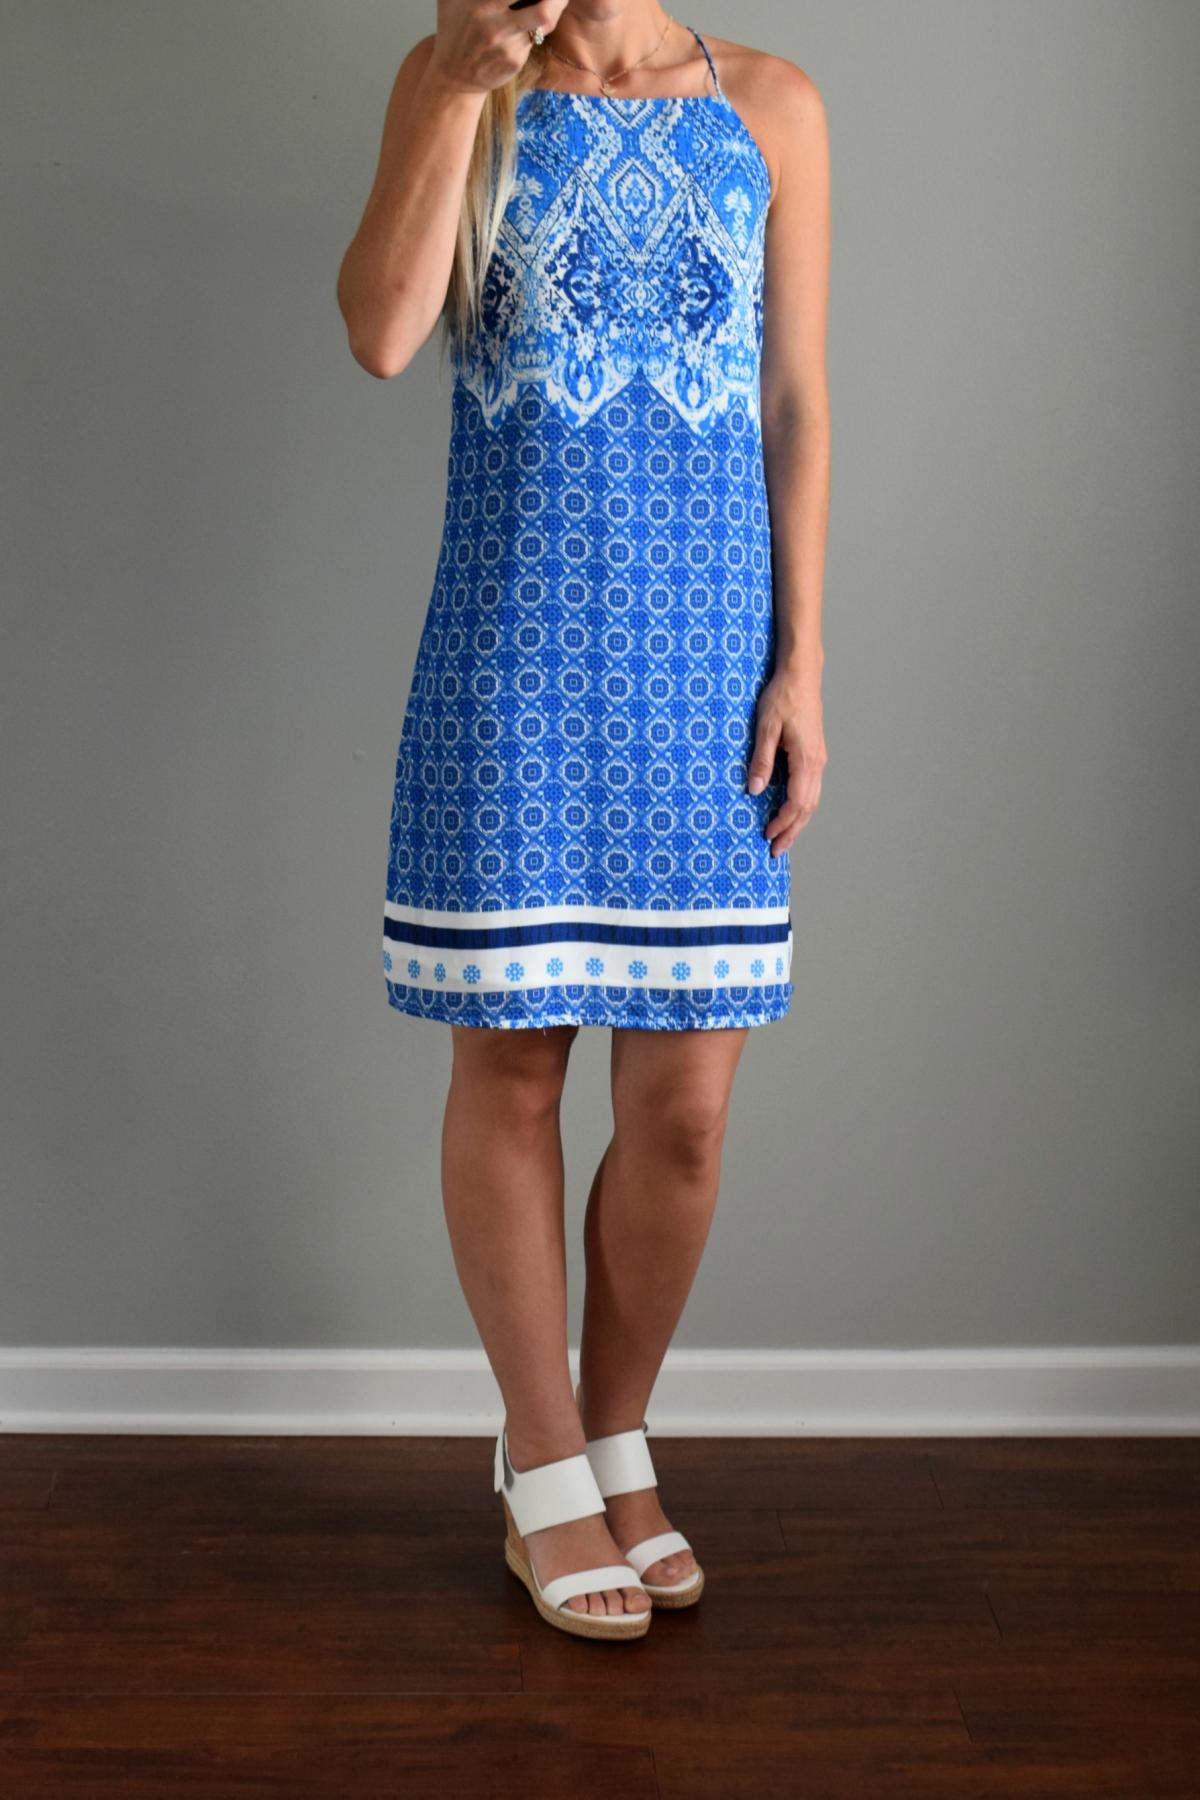 June 2016 Stitch Fix Review: Skies are Blue Lucielle Dress |www.pearlsandsportsbras.com|